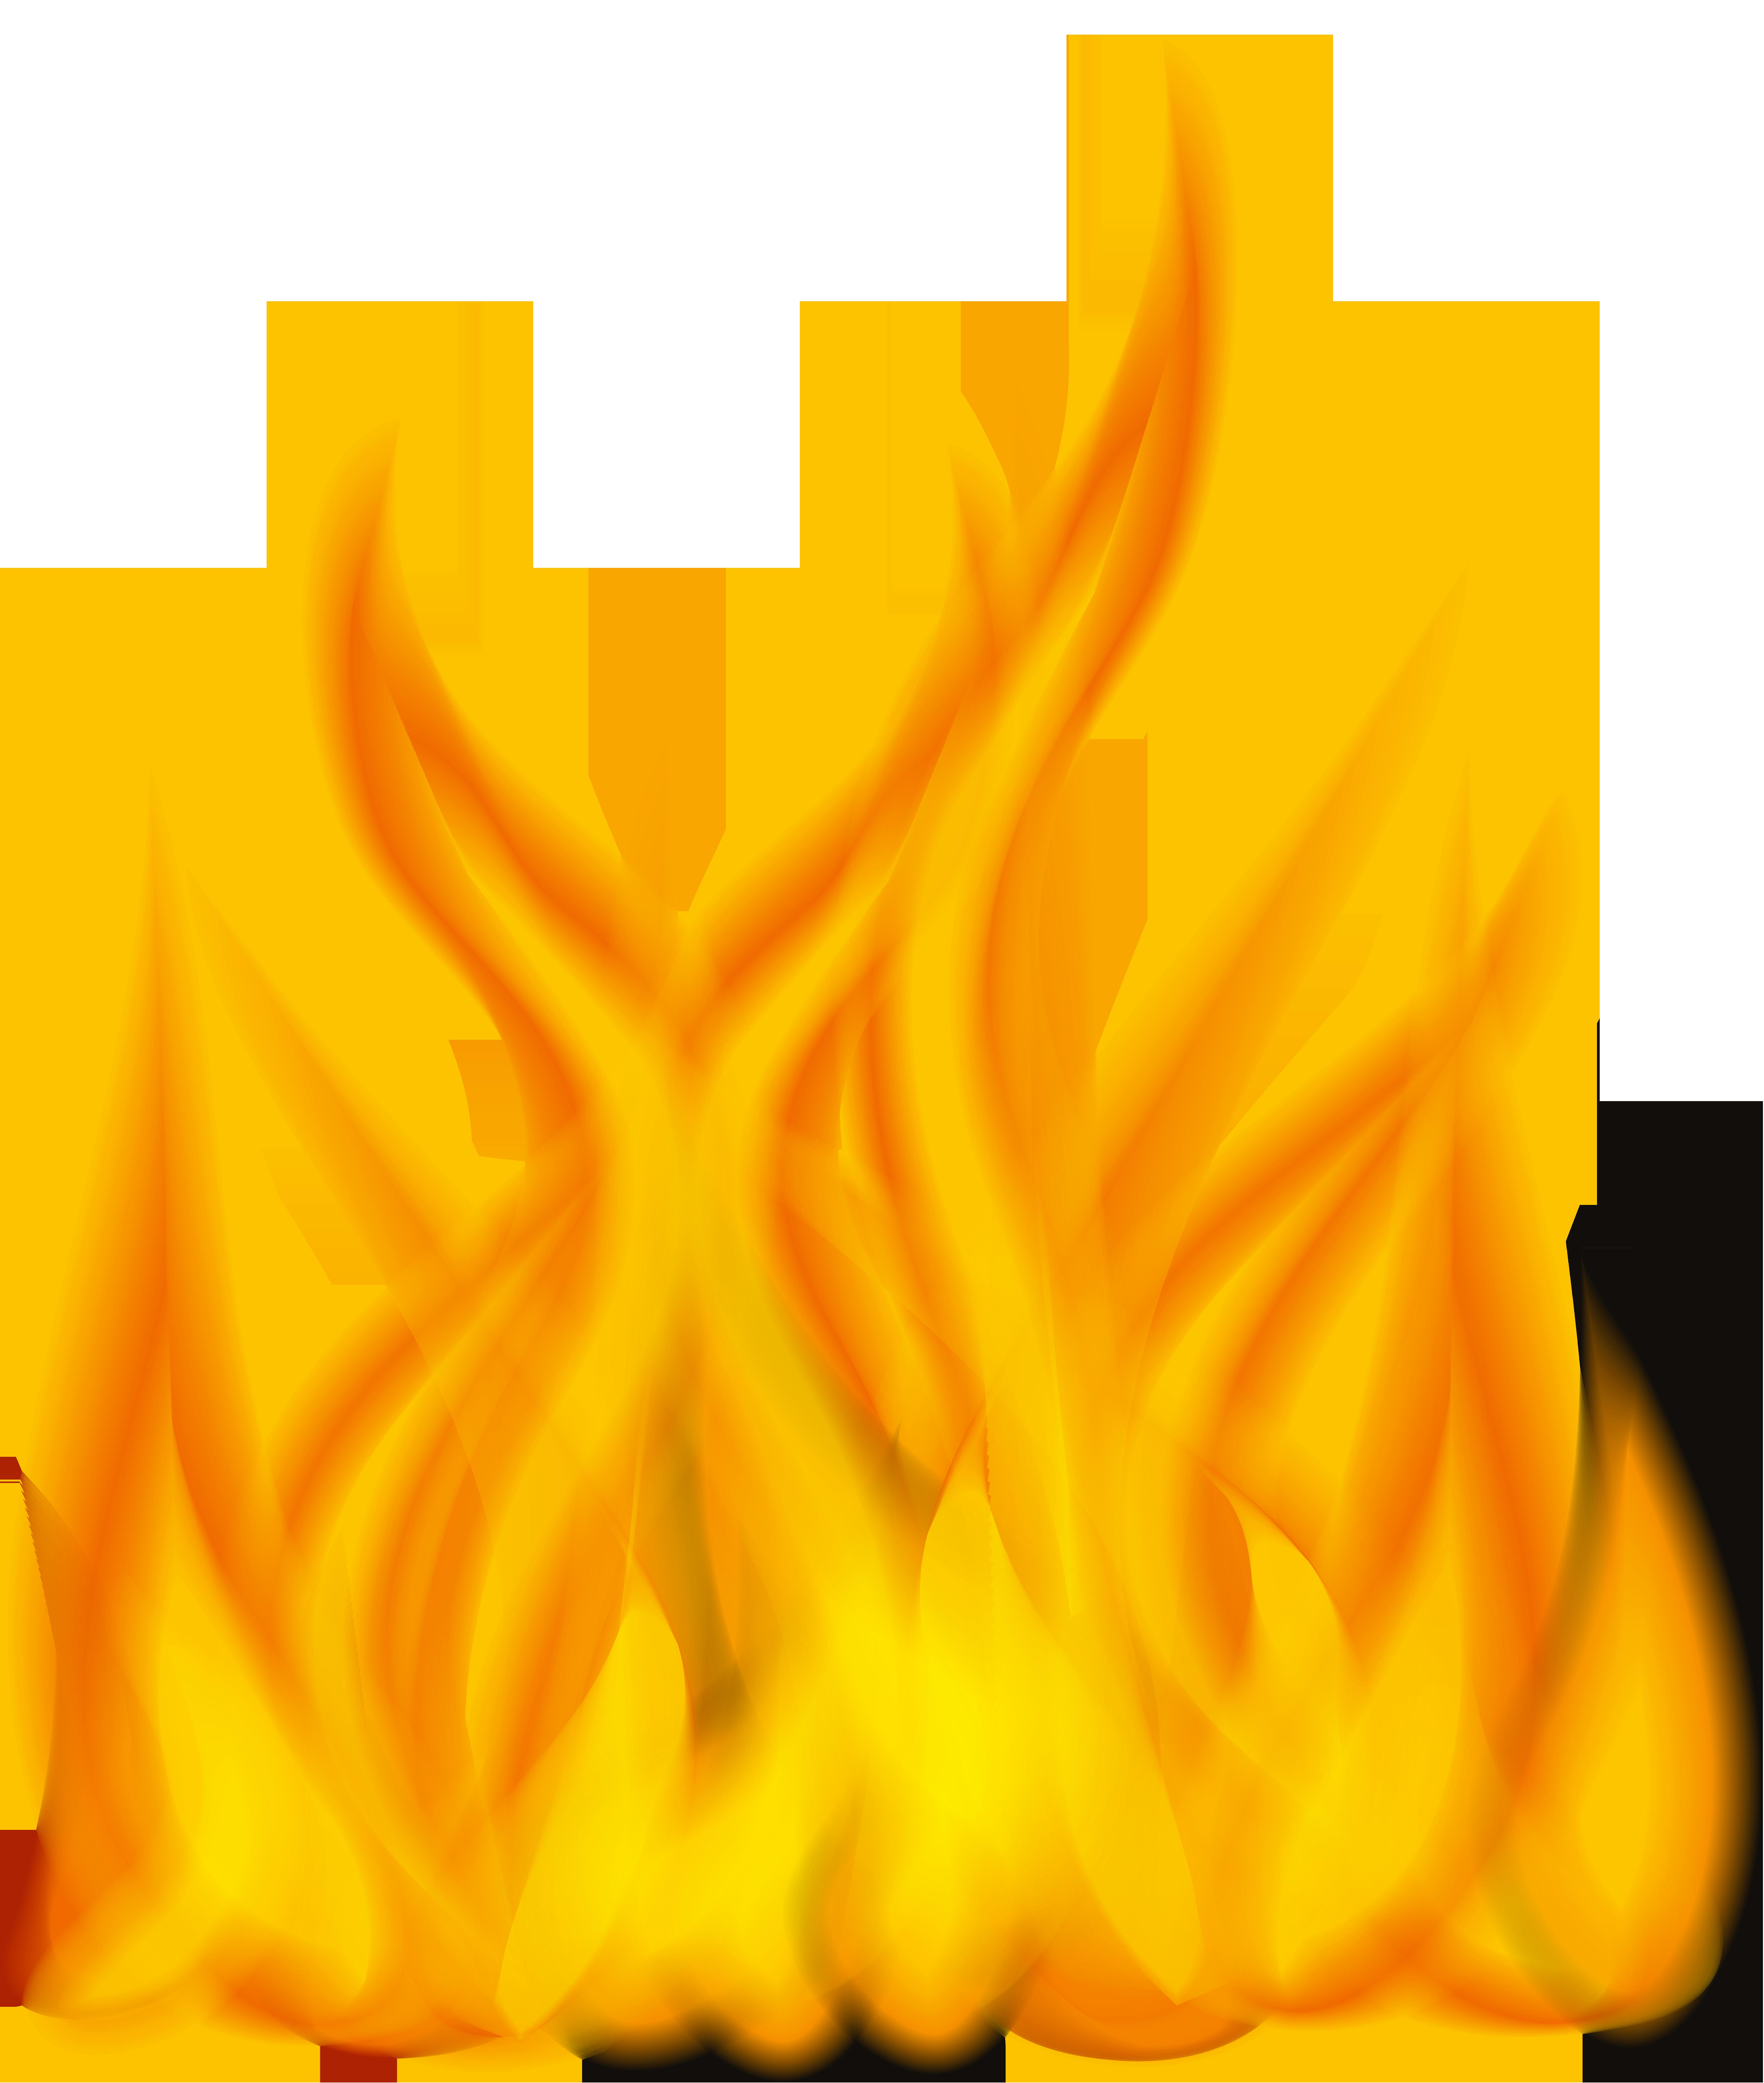 Clipart fire stick. Flames png clip art